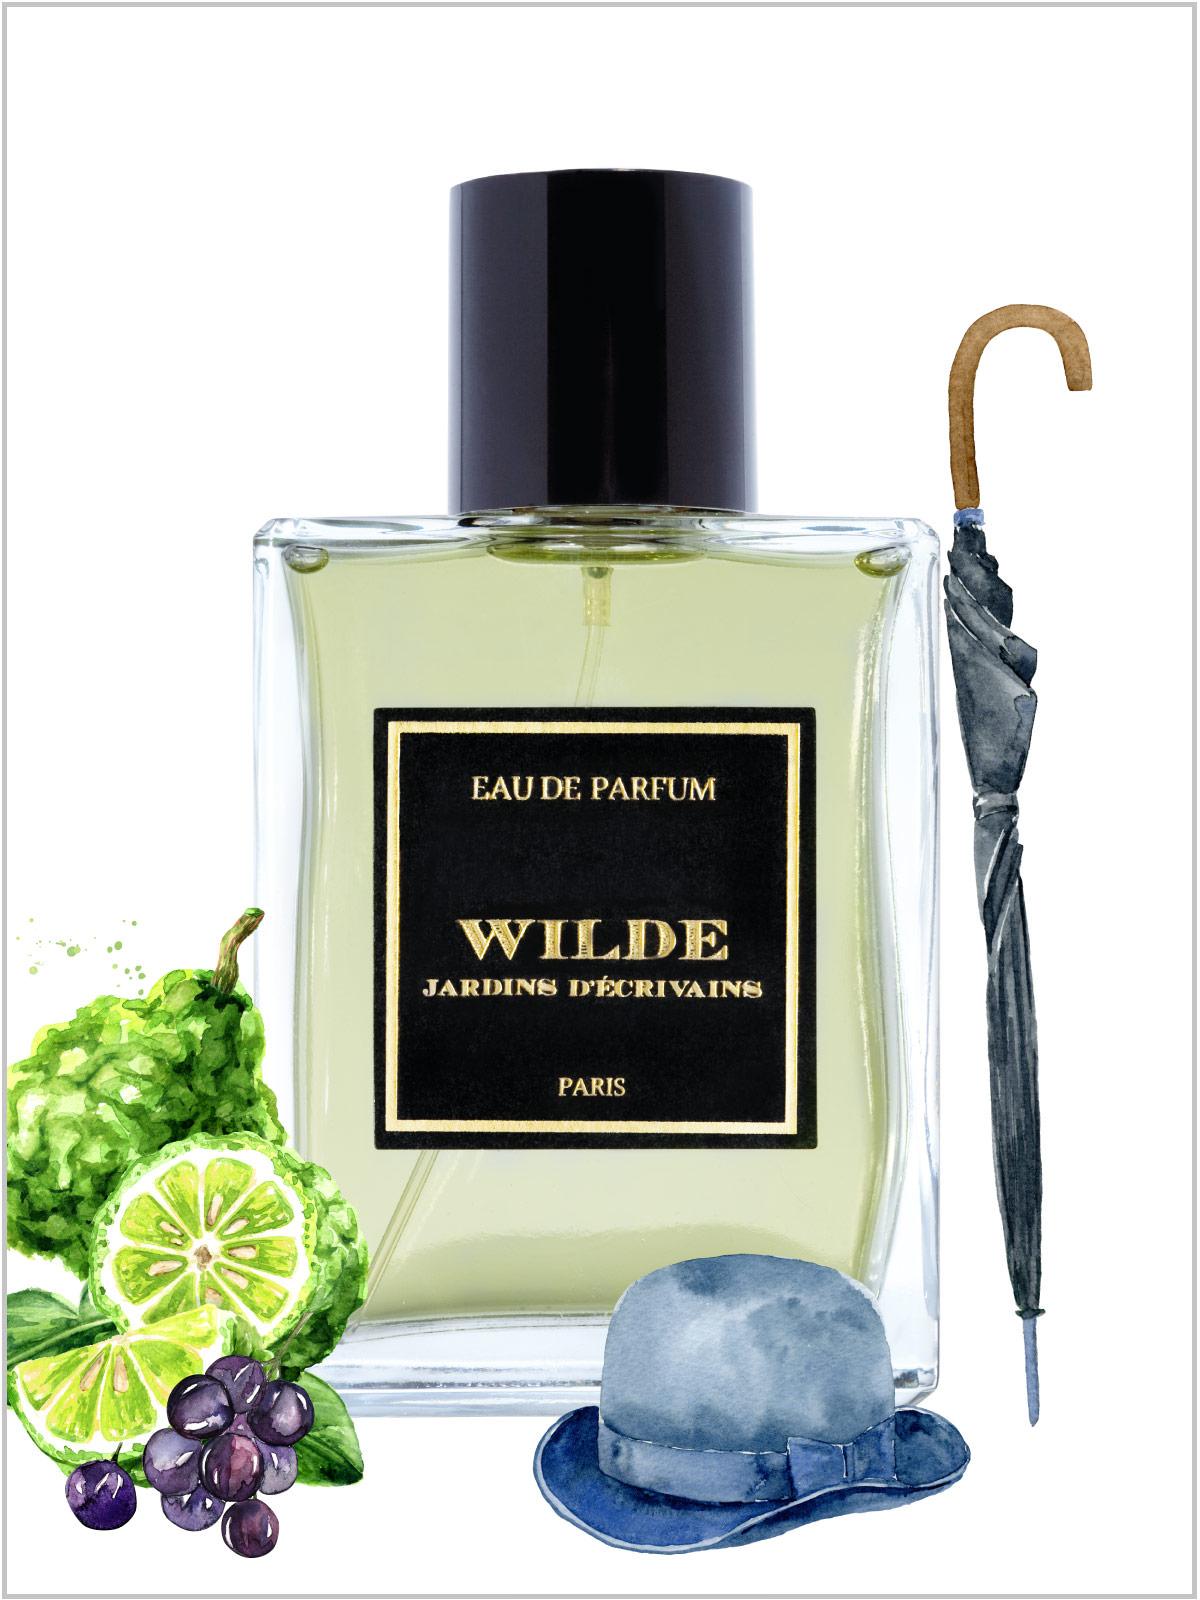 frederickandsophie-beauty-jardins_decrivains-wilde-eaudeparfum